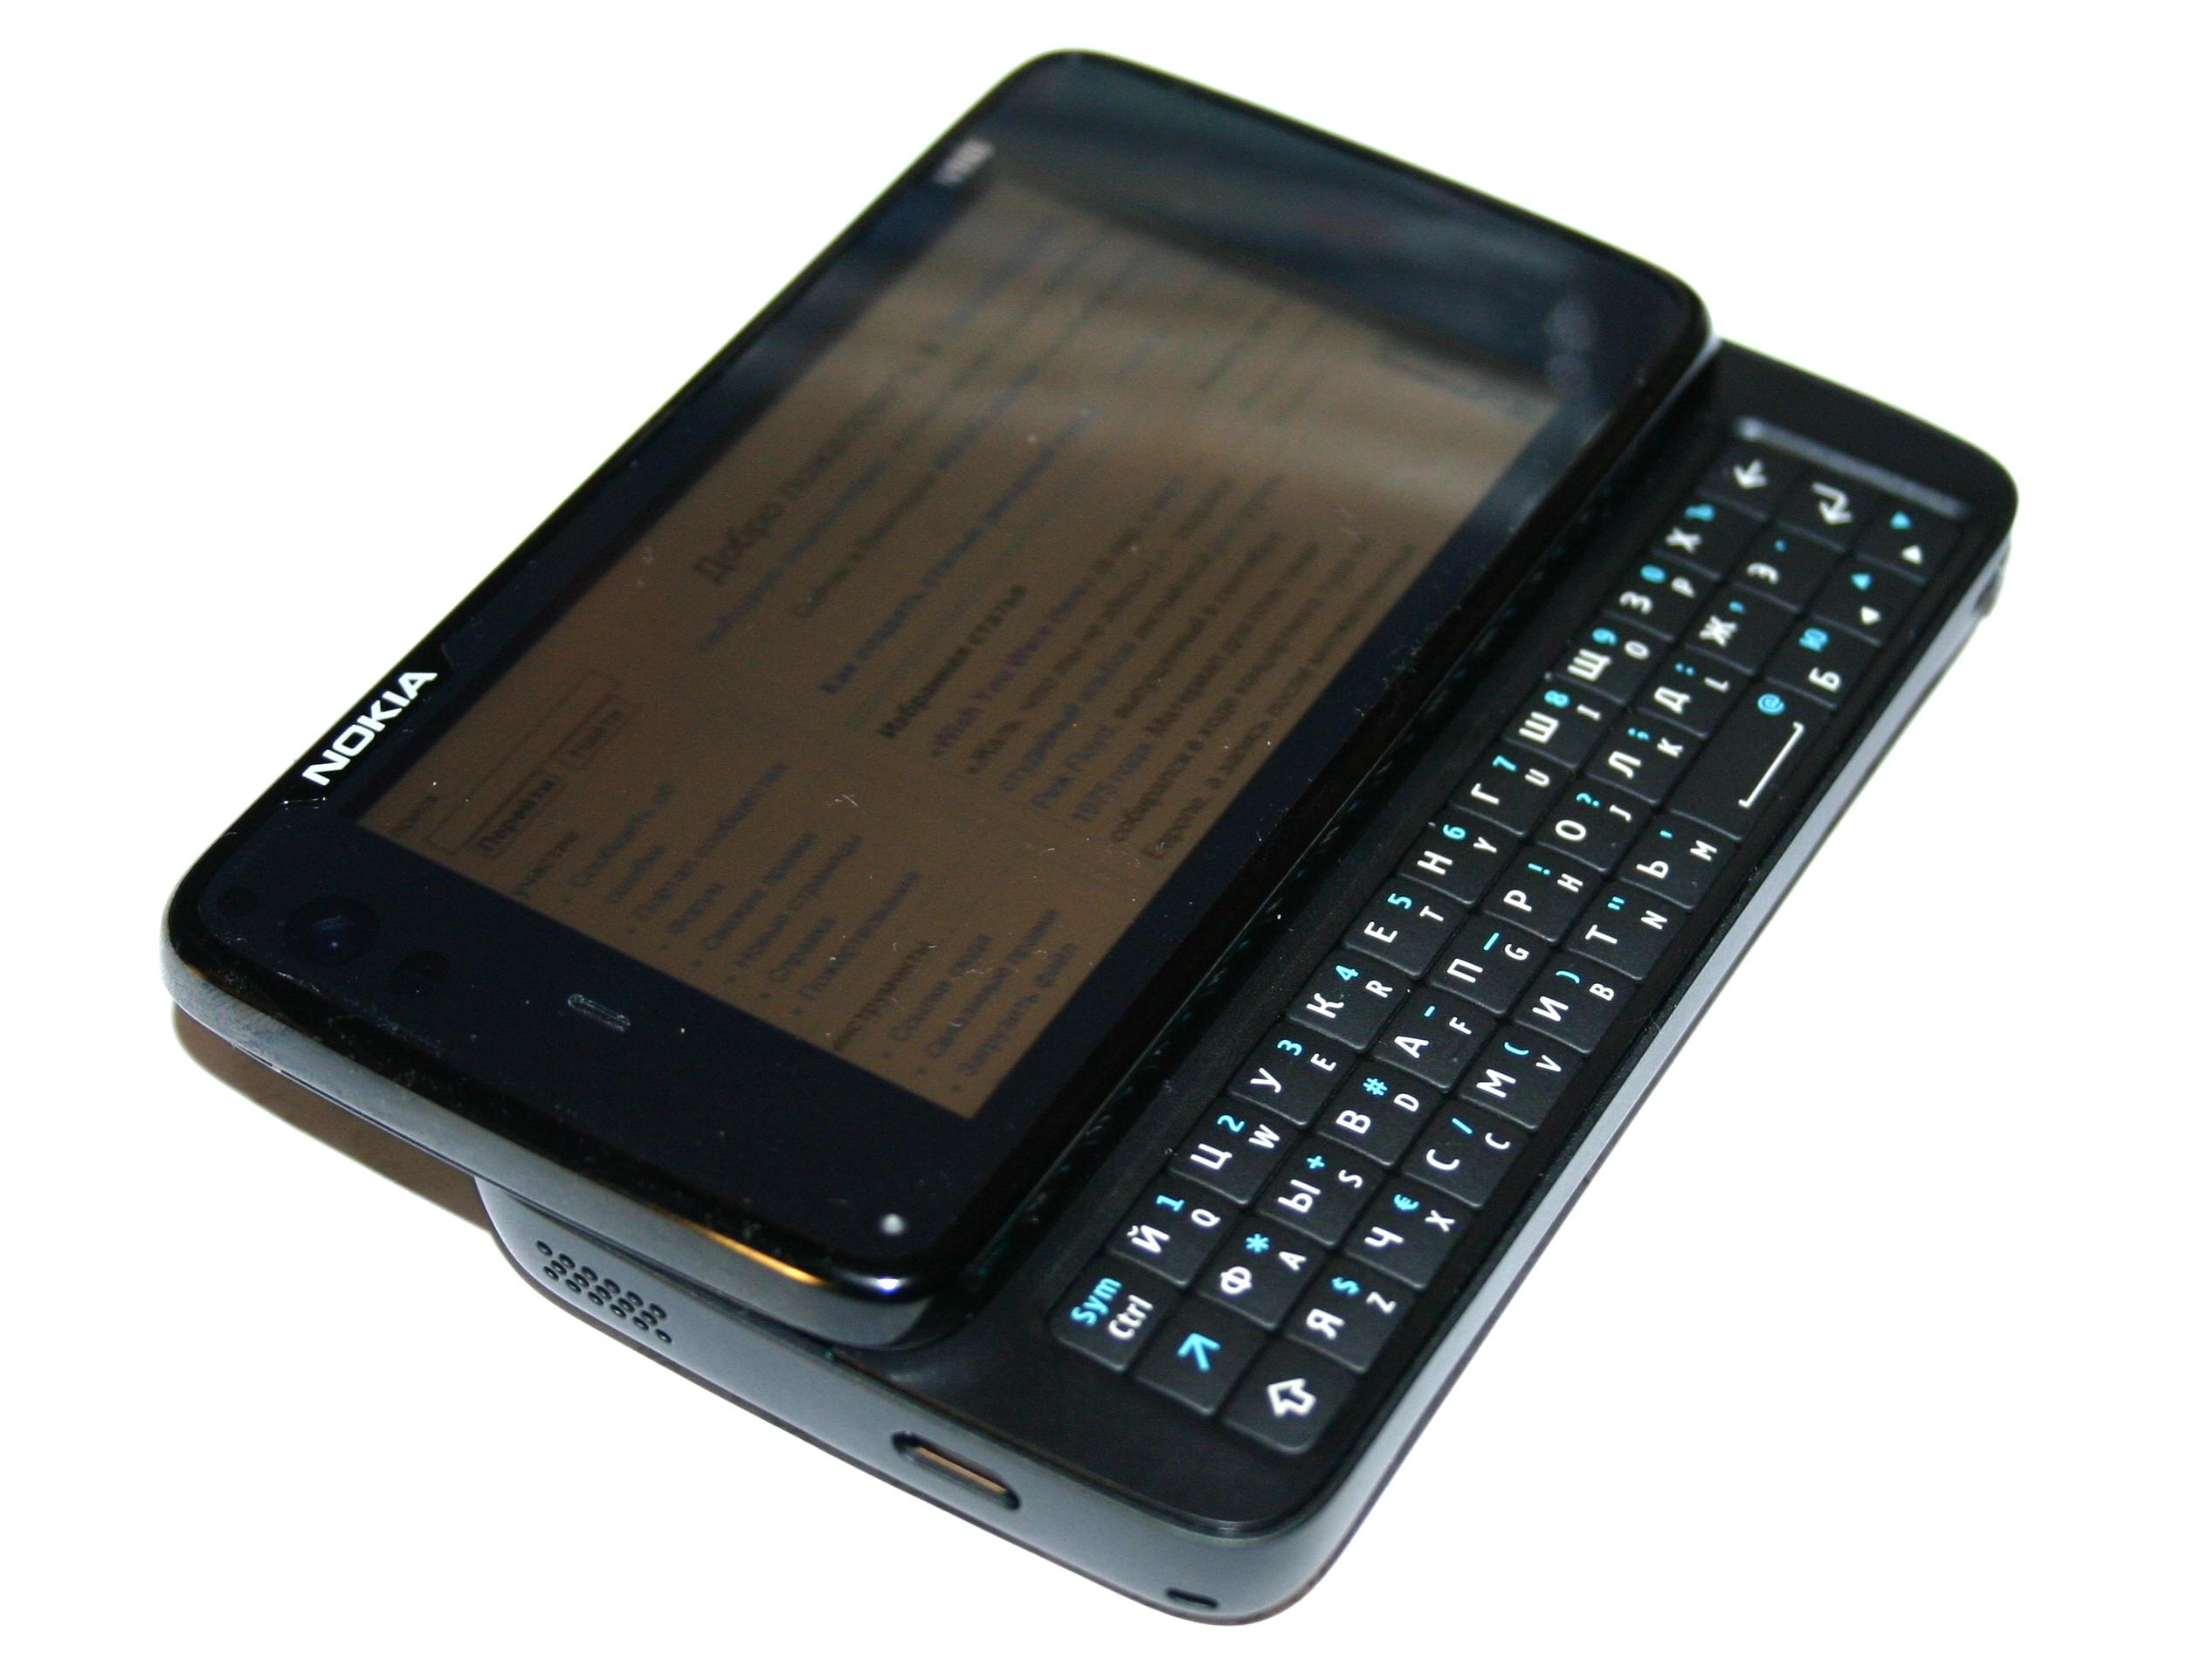 heokia900,aaemoaemo5inuxbasedmobilenternetdeviceandtouchscreensmartphonefromokiasseriesportfolio.